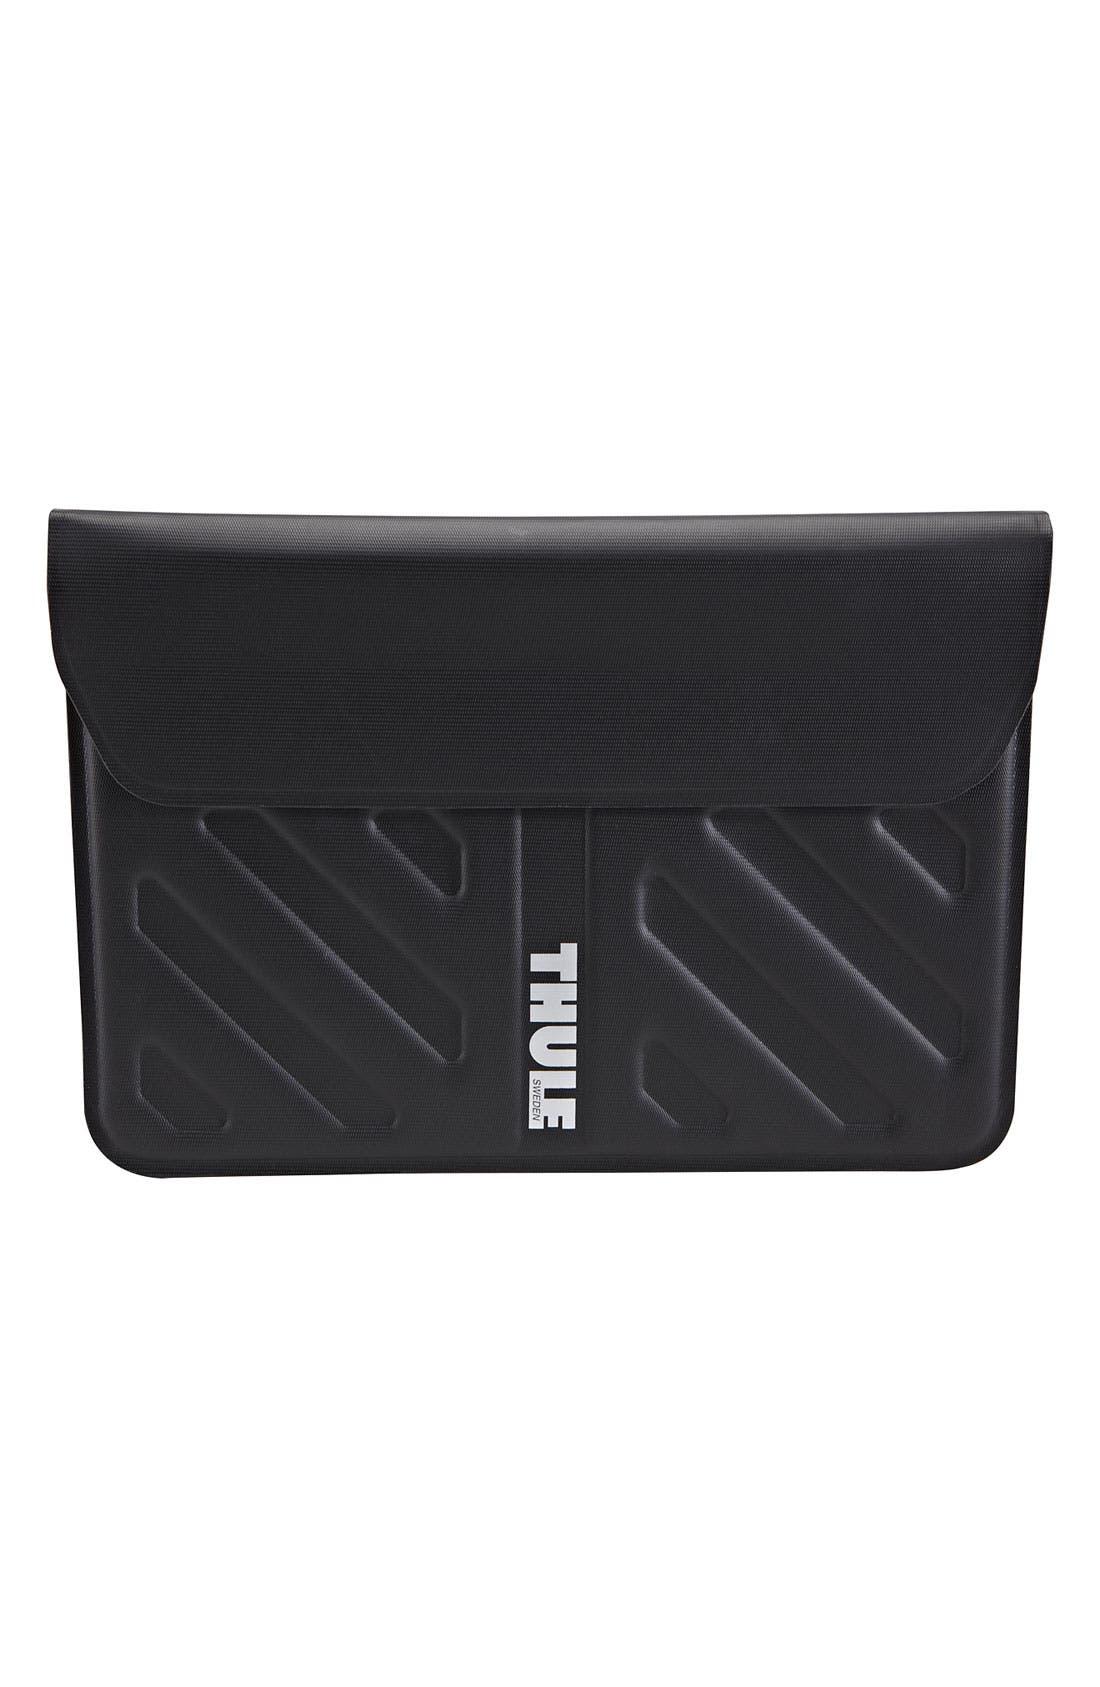 Main Image - Thule MacBook Air Sleeve (13 Inch)